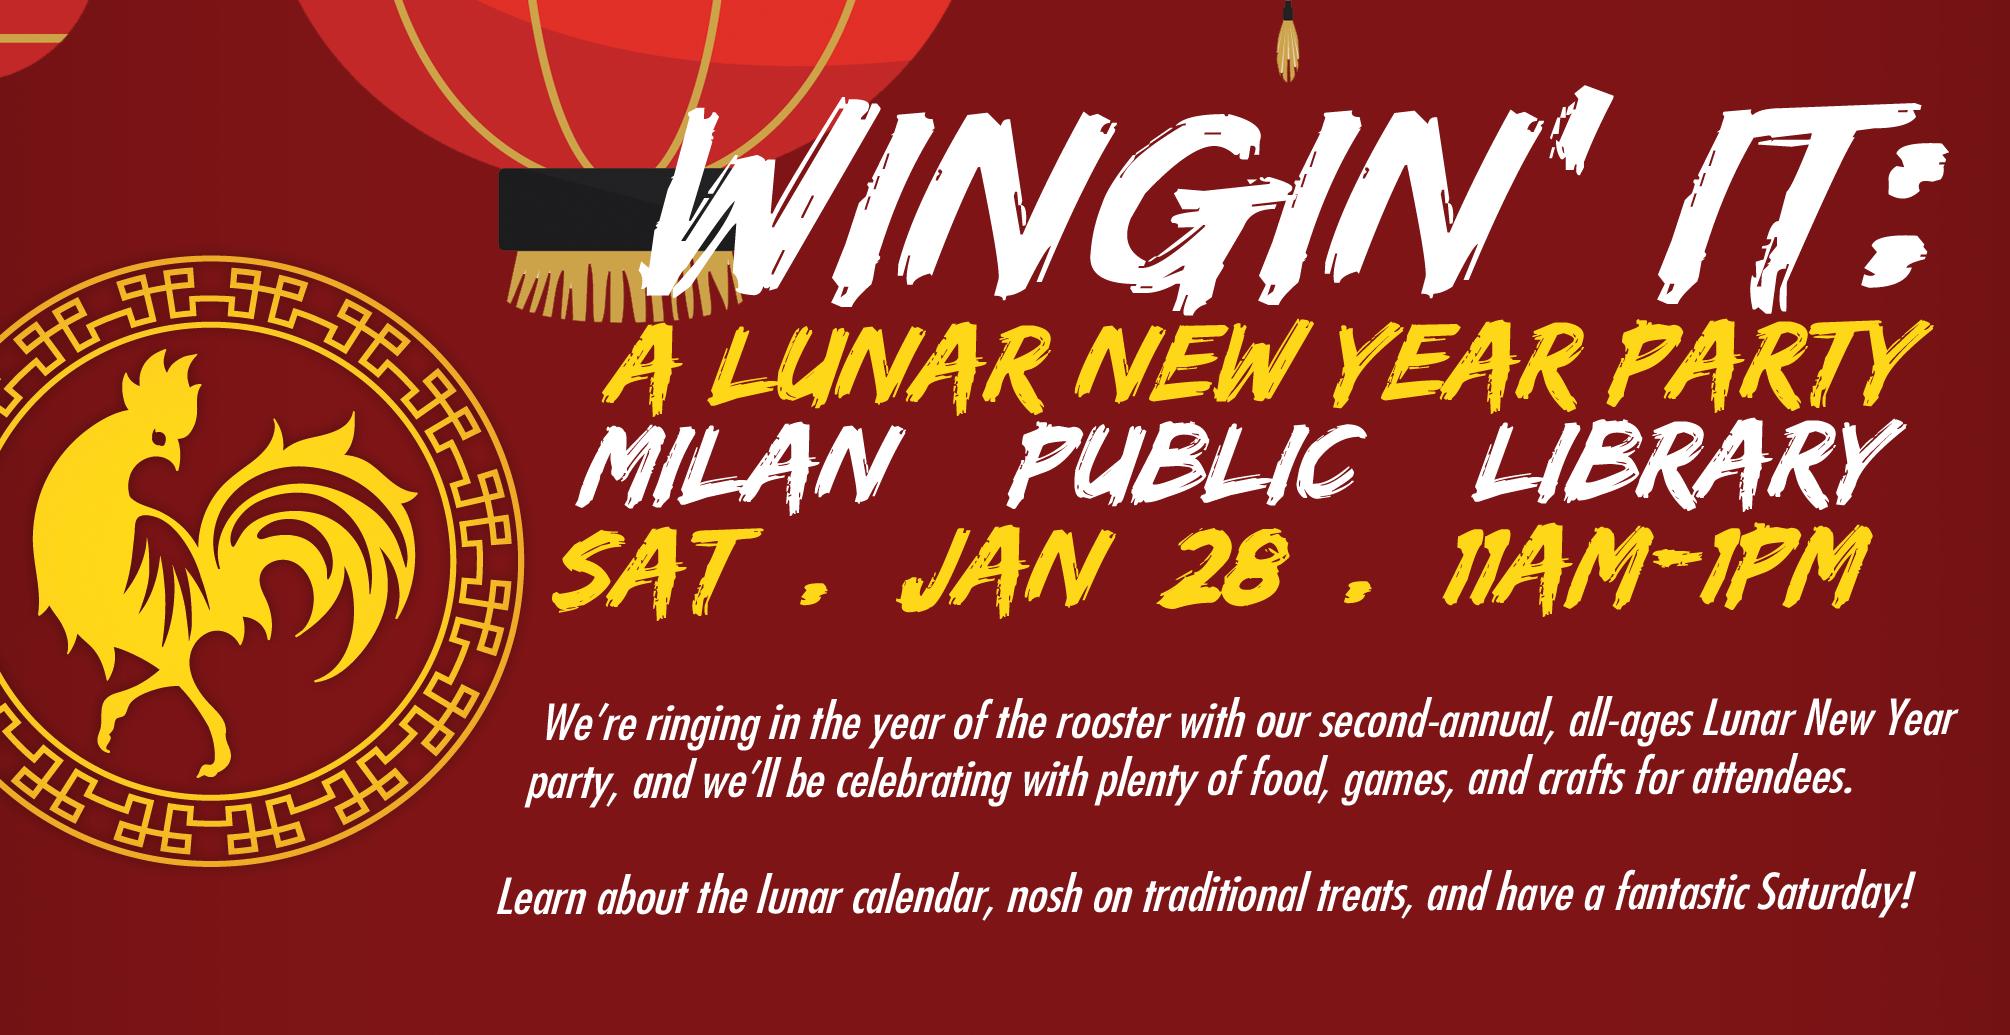 2017-01-ADULT-Milan-Lunar-New-Year-Slide